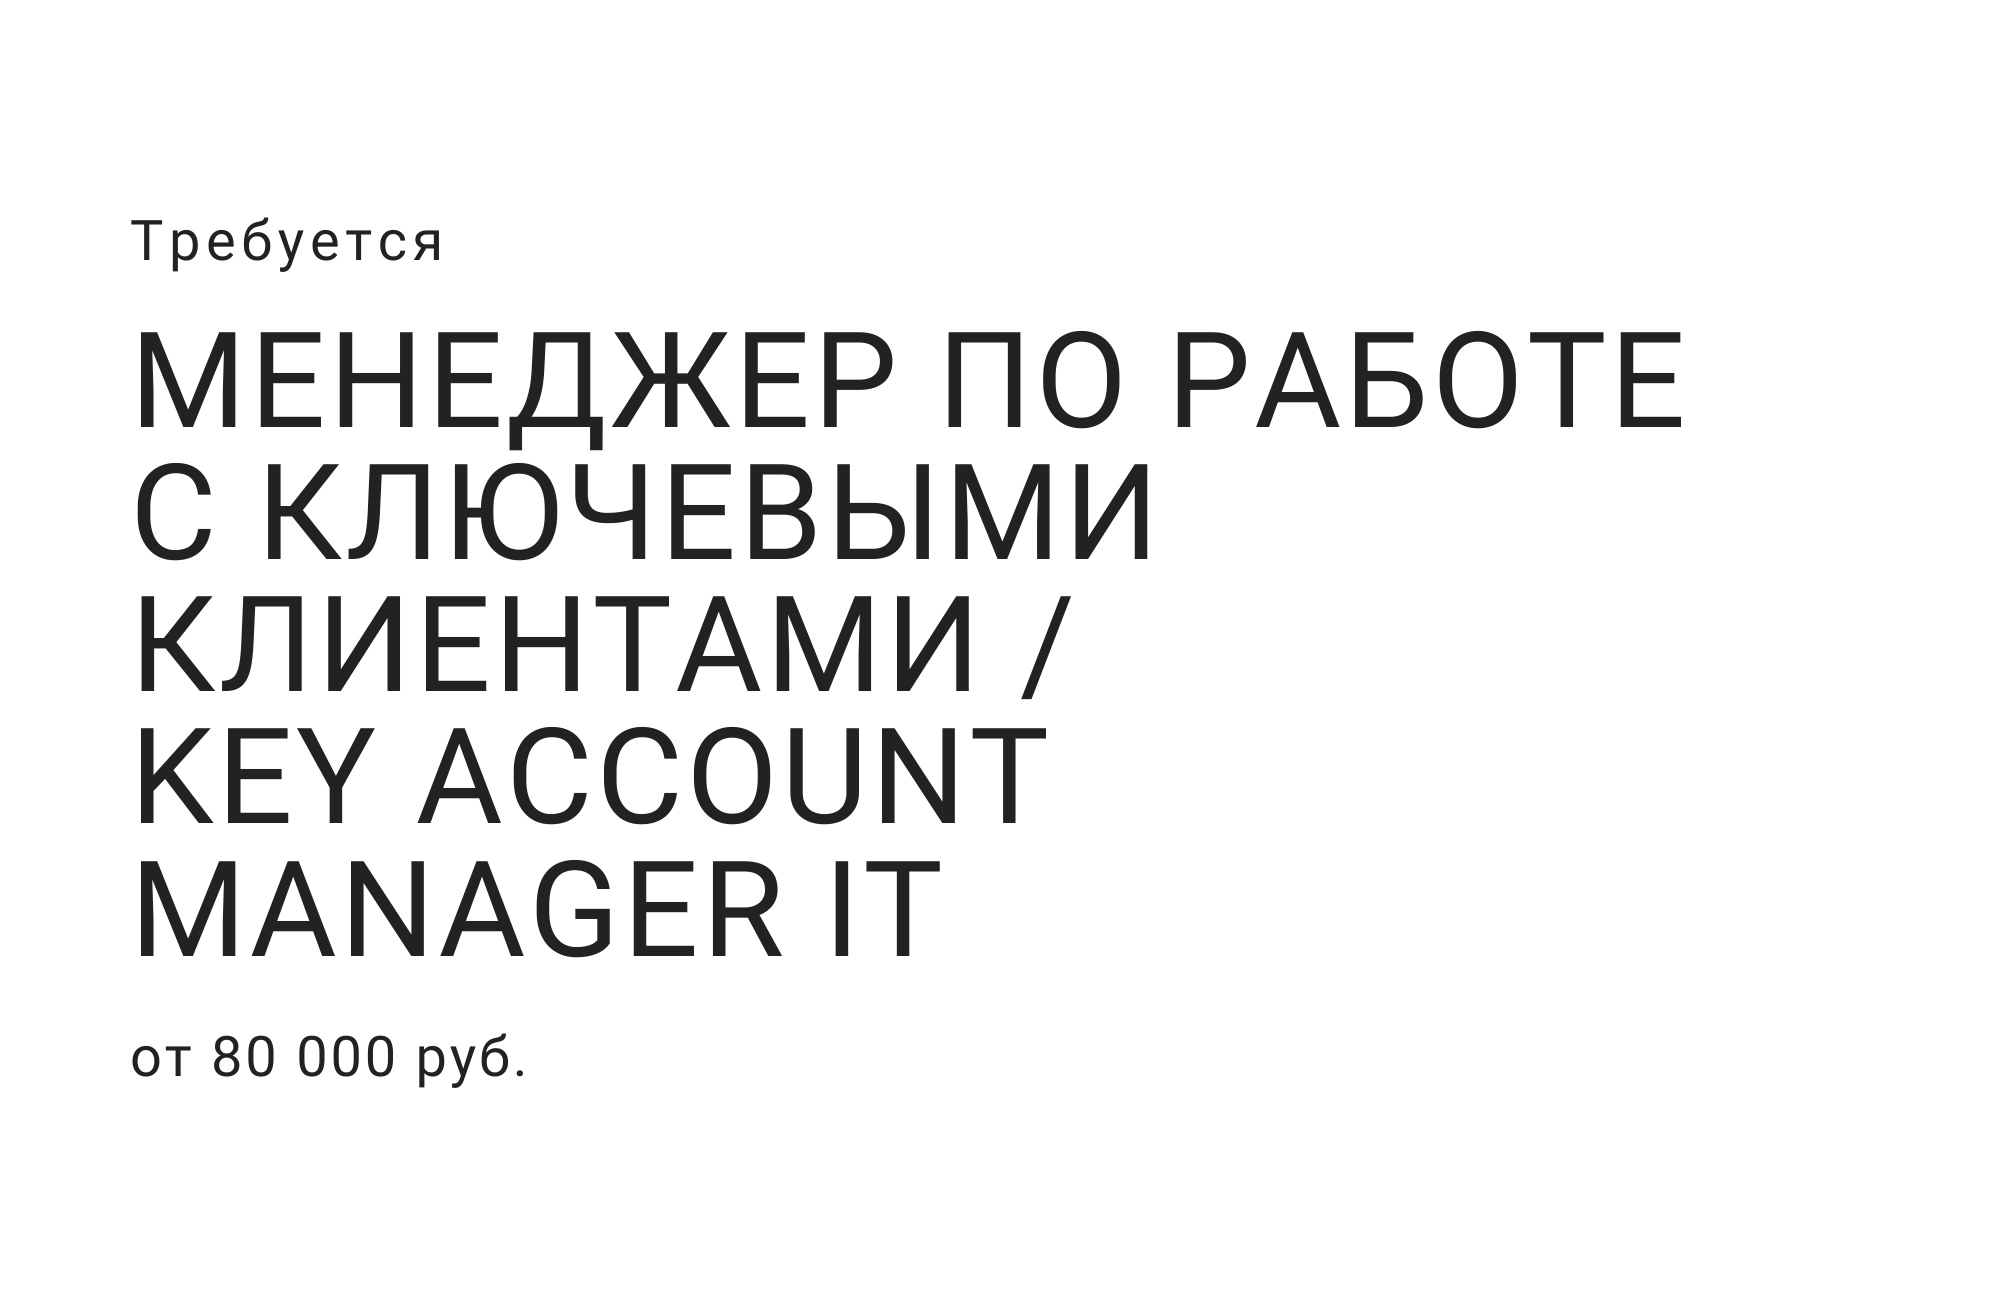 Key Account manager IT / Менеджер по работе с ключевыми клиентами